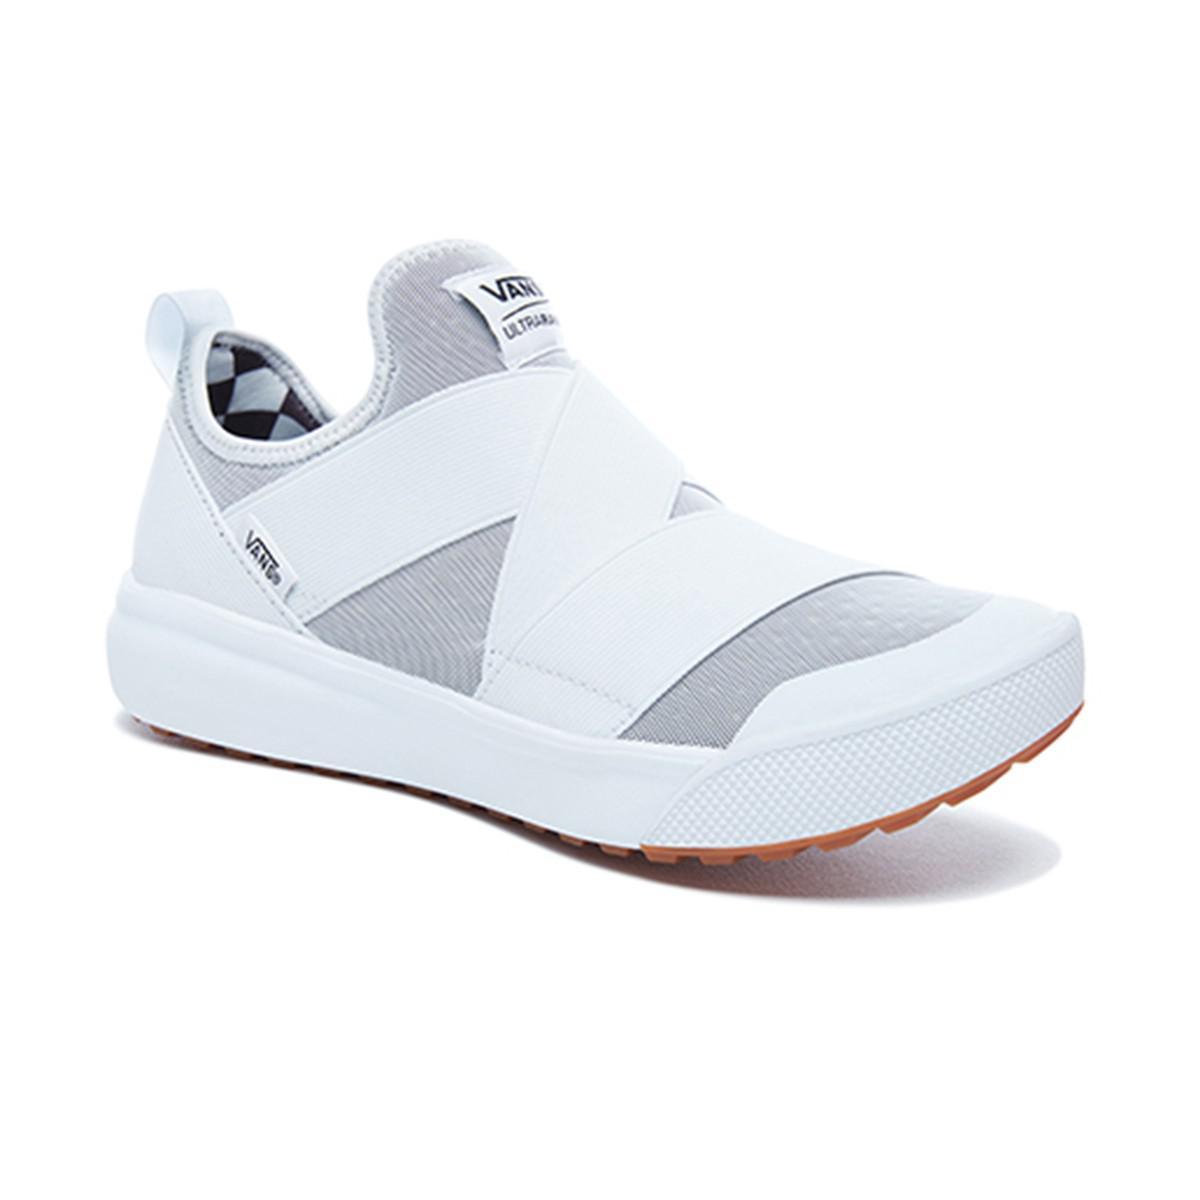 ULTRARANGE GORE - Sneaker low - orange FxQ4M